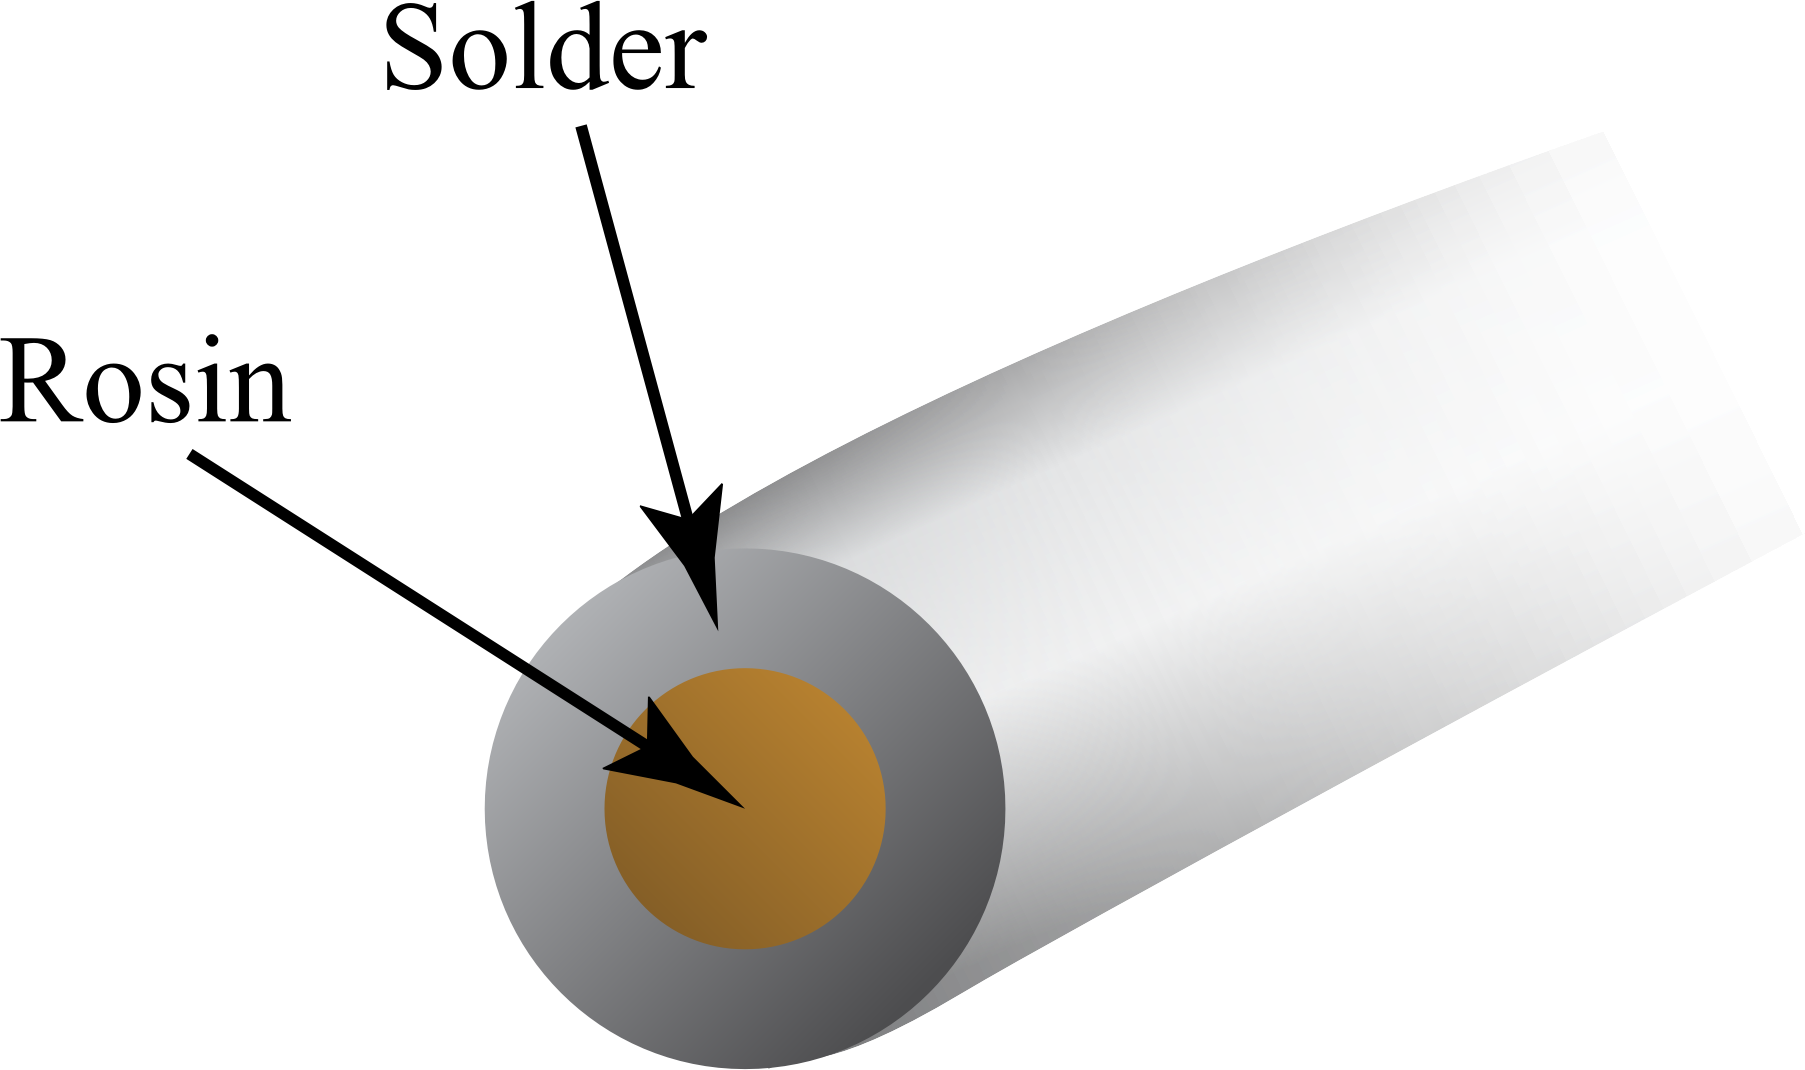 Welding clipart soldering. Inside rosin core solder